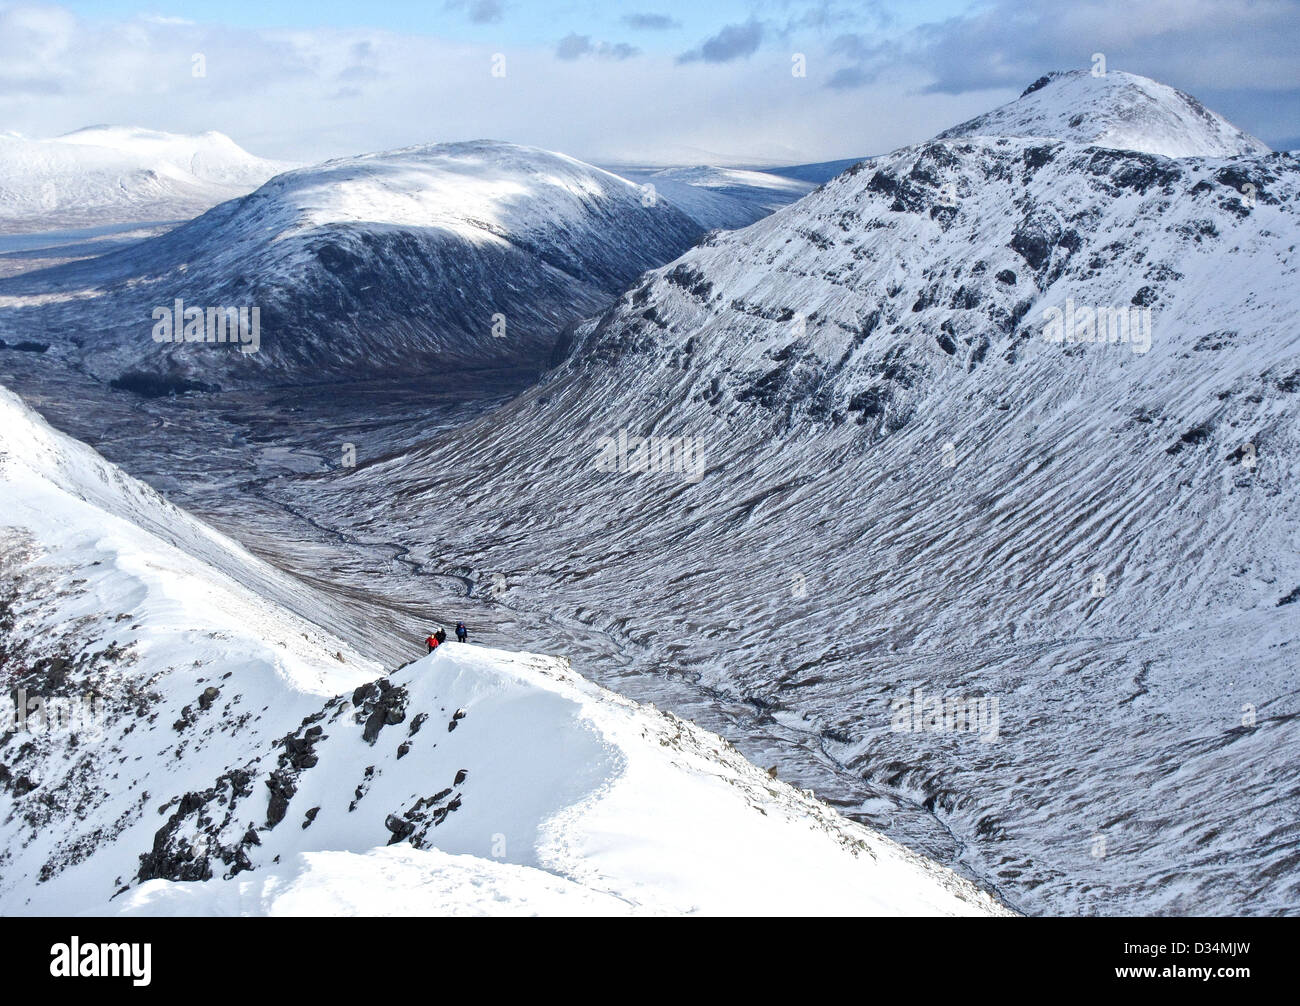 Scottish mountain buachaille etive mor  from Buachaille Etive Beag  in Glencoe  in Scottish highlands, Scotland Stock Photo